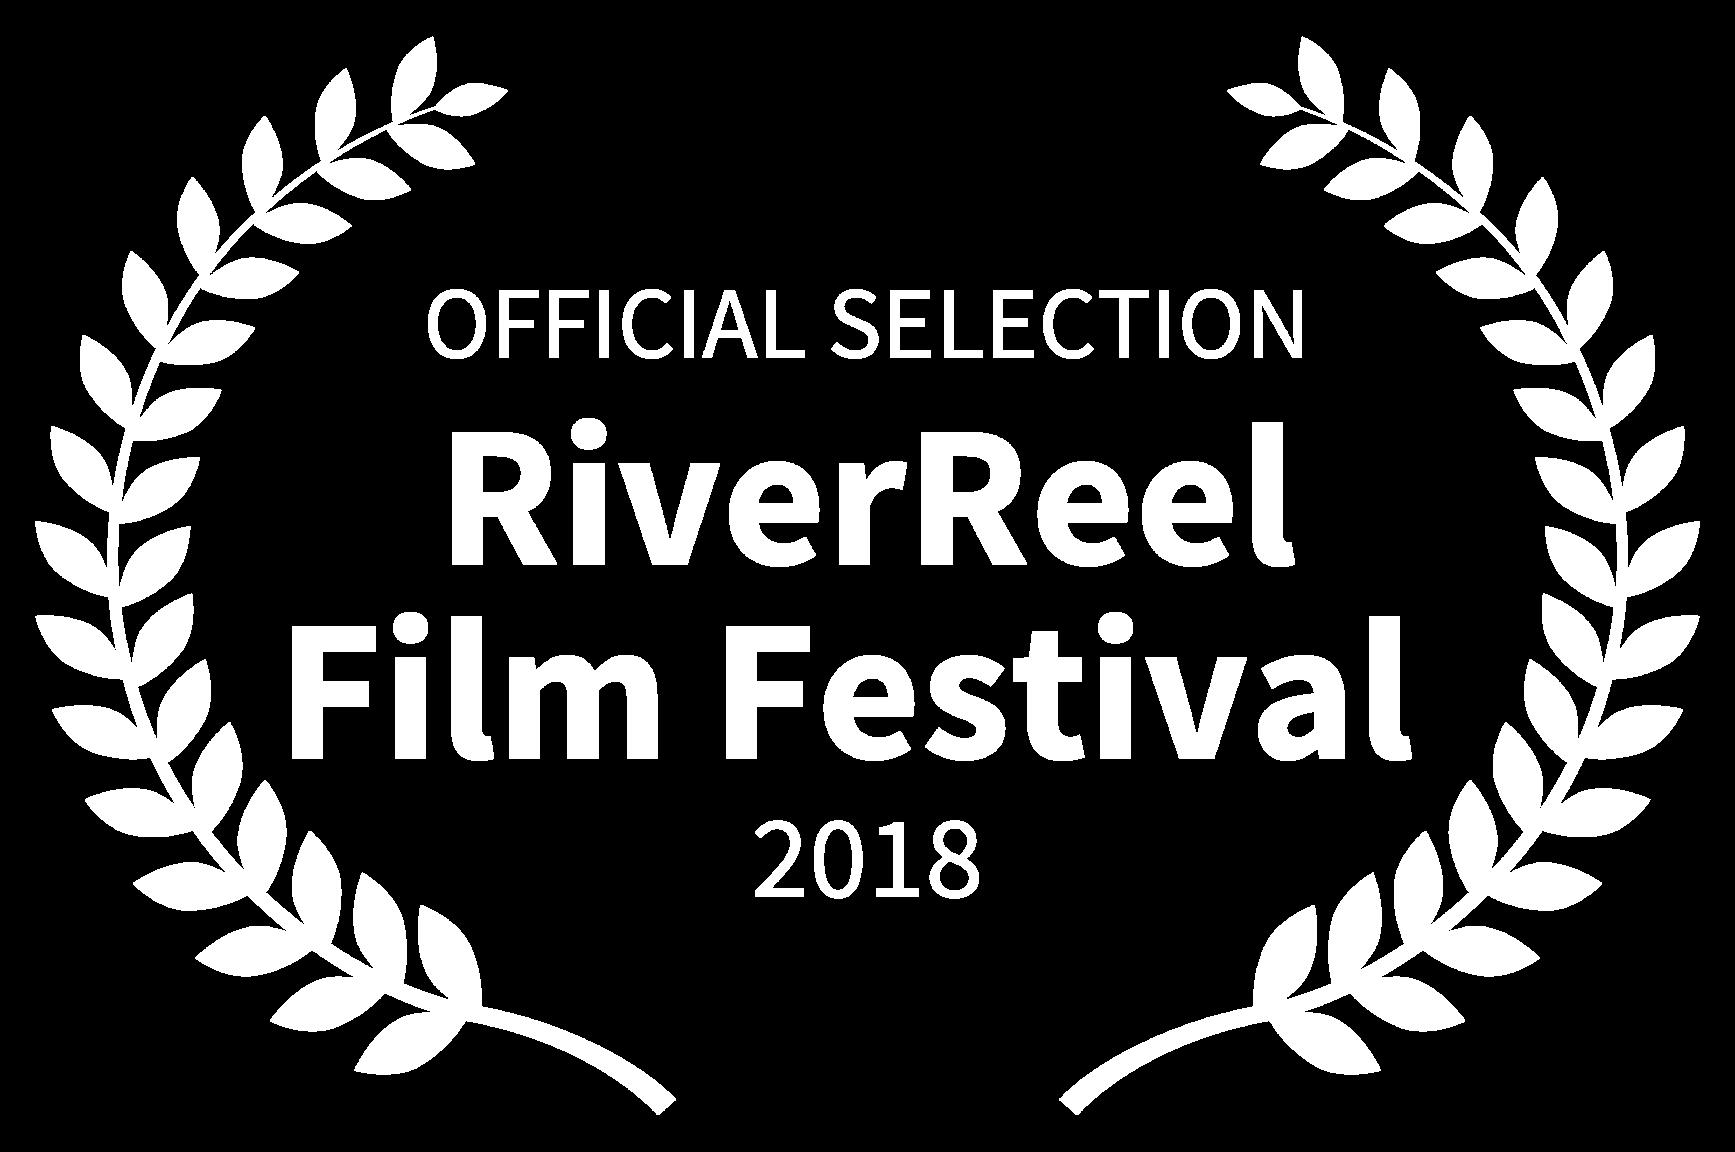 OFFICIAL SELECTION - RiverReel Film Festival  - 2018.png